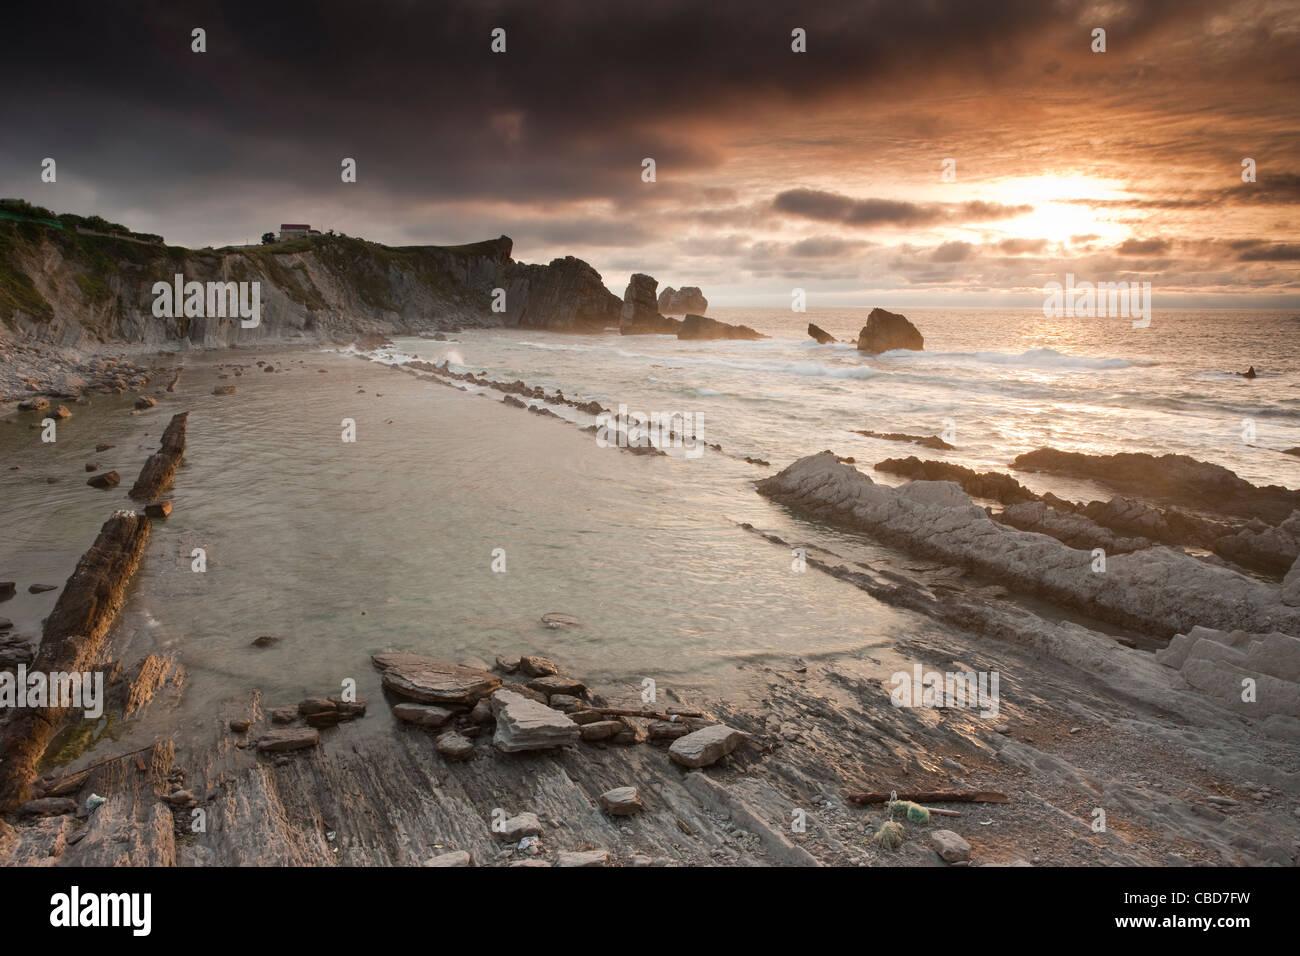 Waves washing up on rocky beach - Stock Image